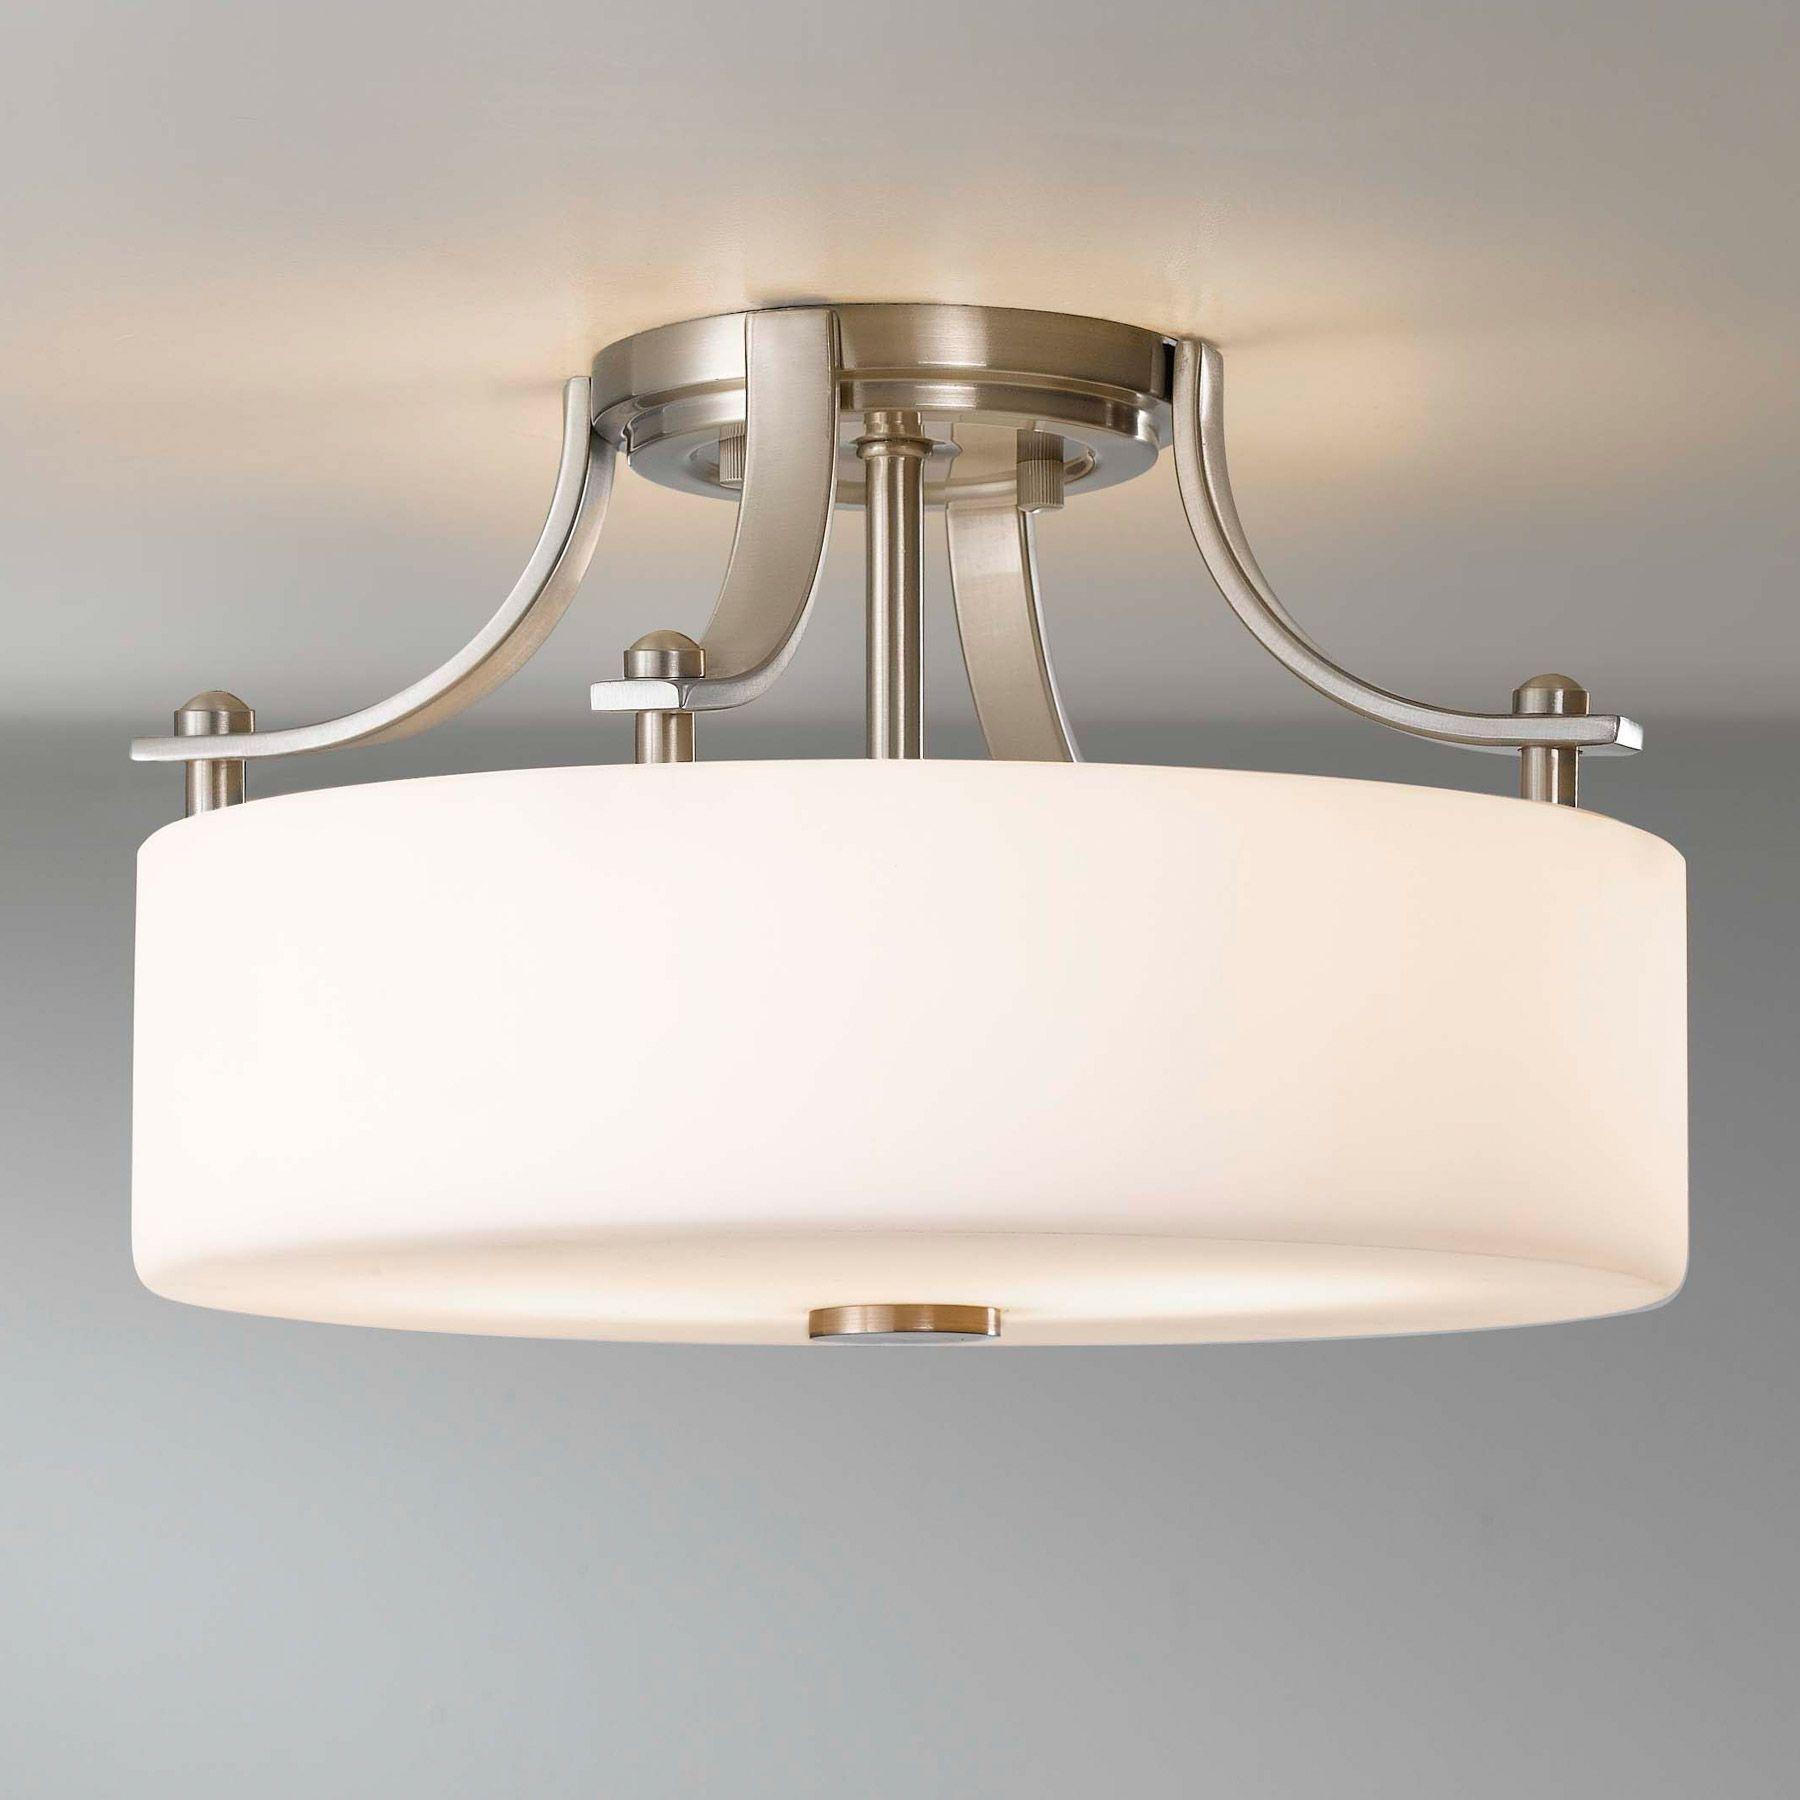 flush mount kitchen ceiling light fixtures